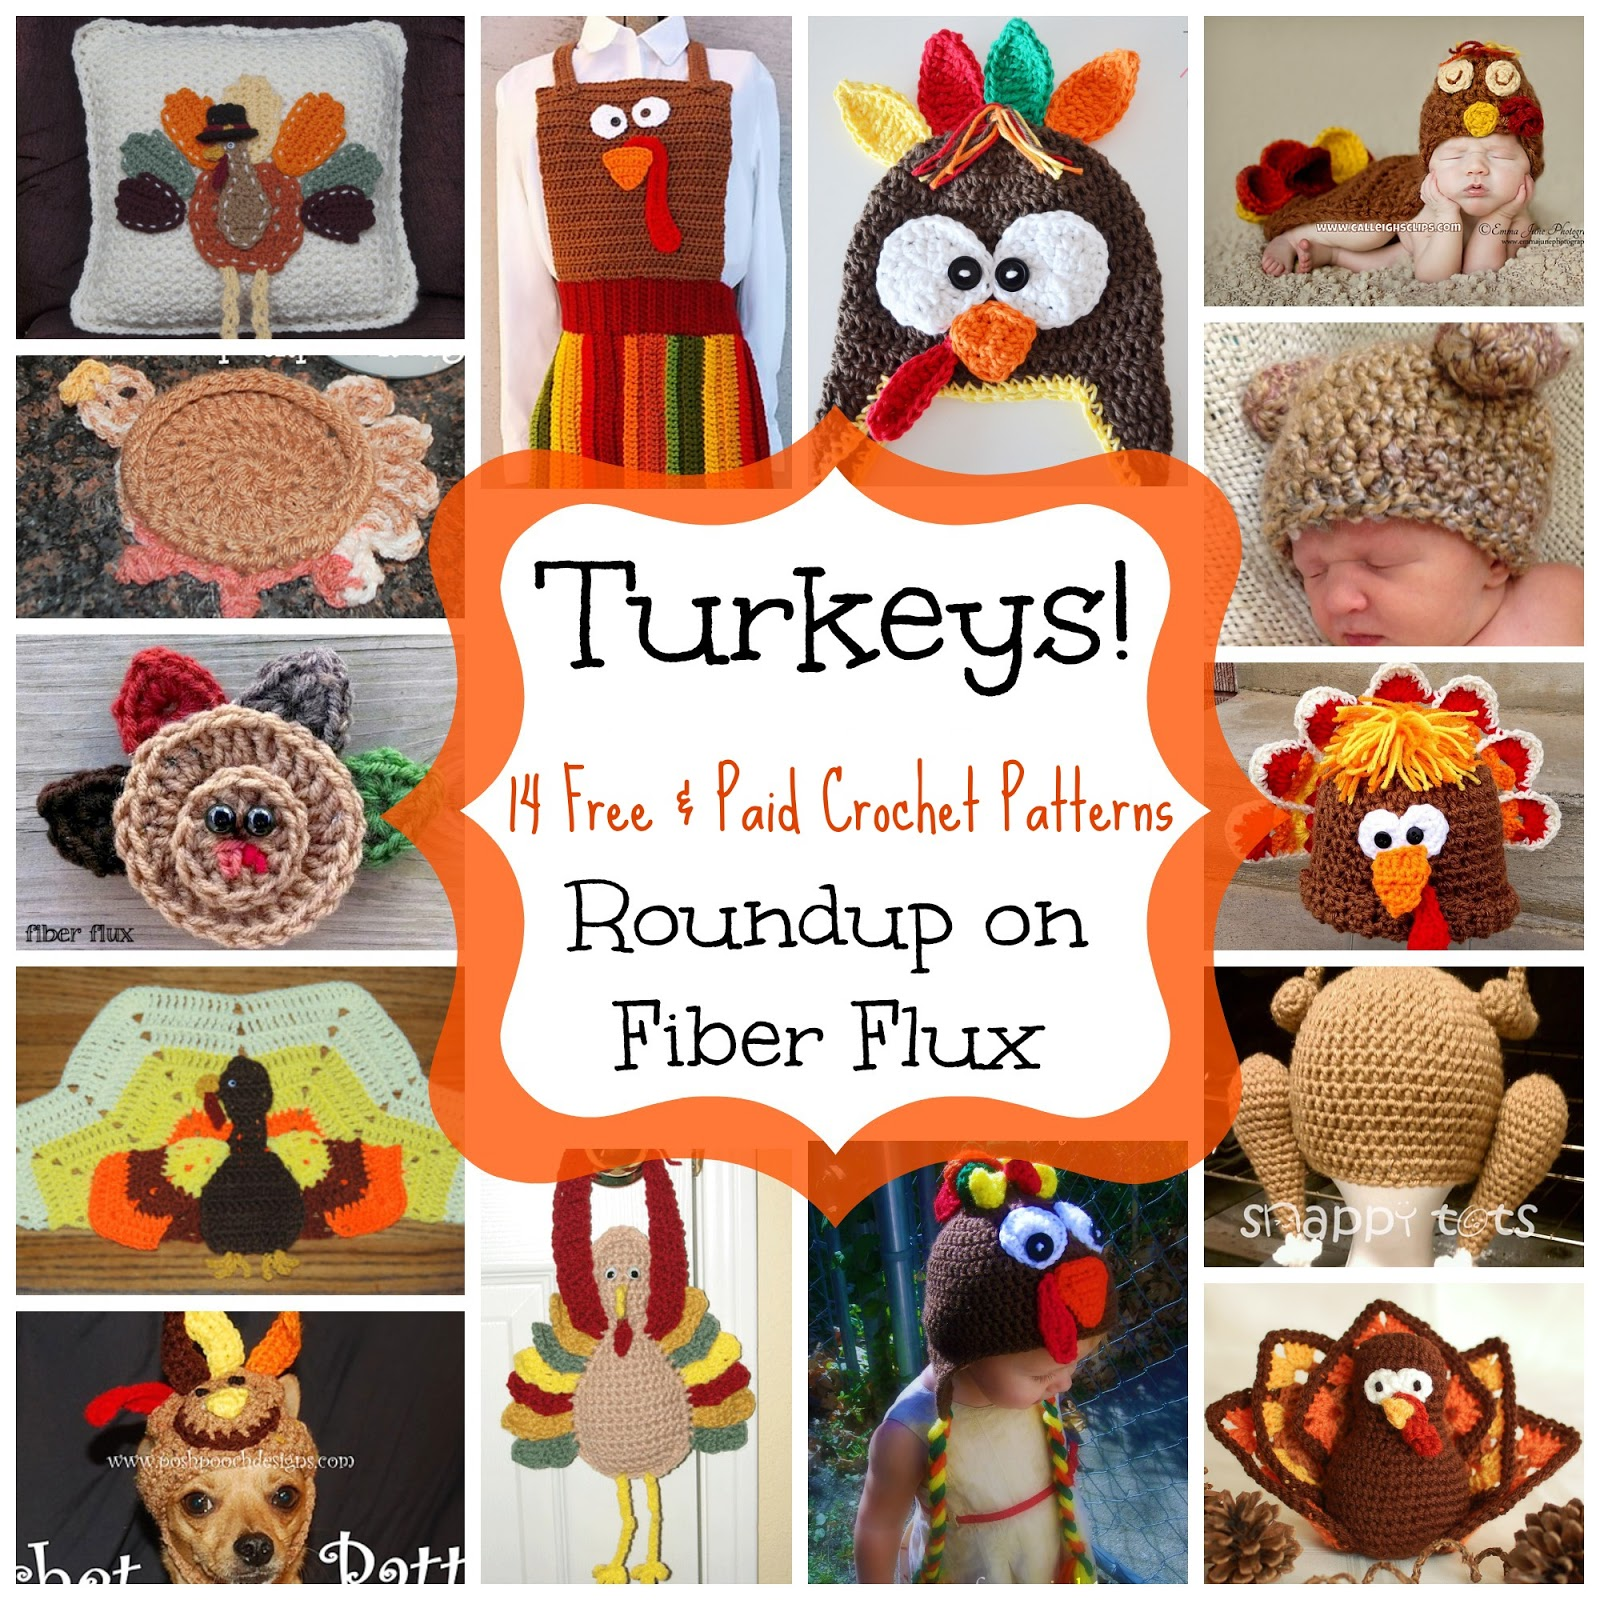 Fiber flux turkeys 14 free and paid crochet patterns 14 free and paid crochet patterns bankloansurffo Gallery